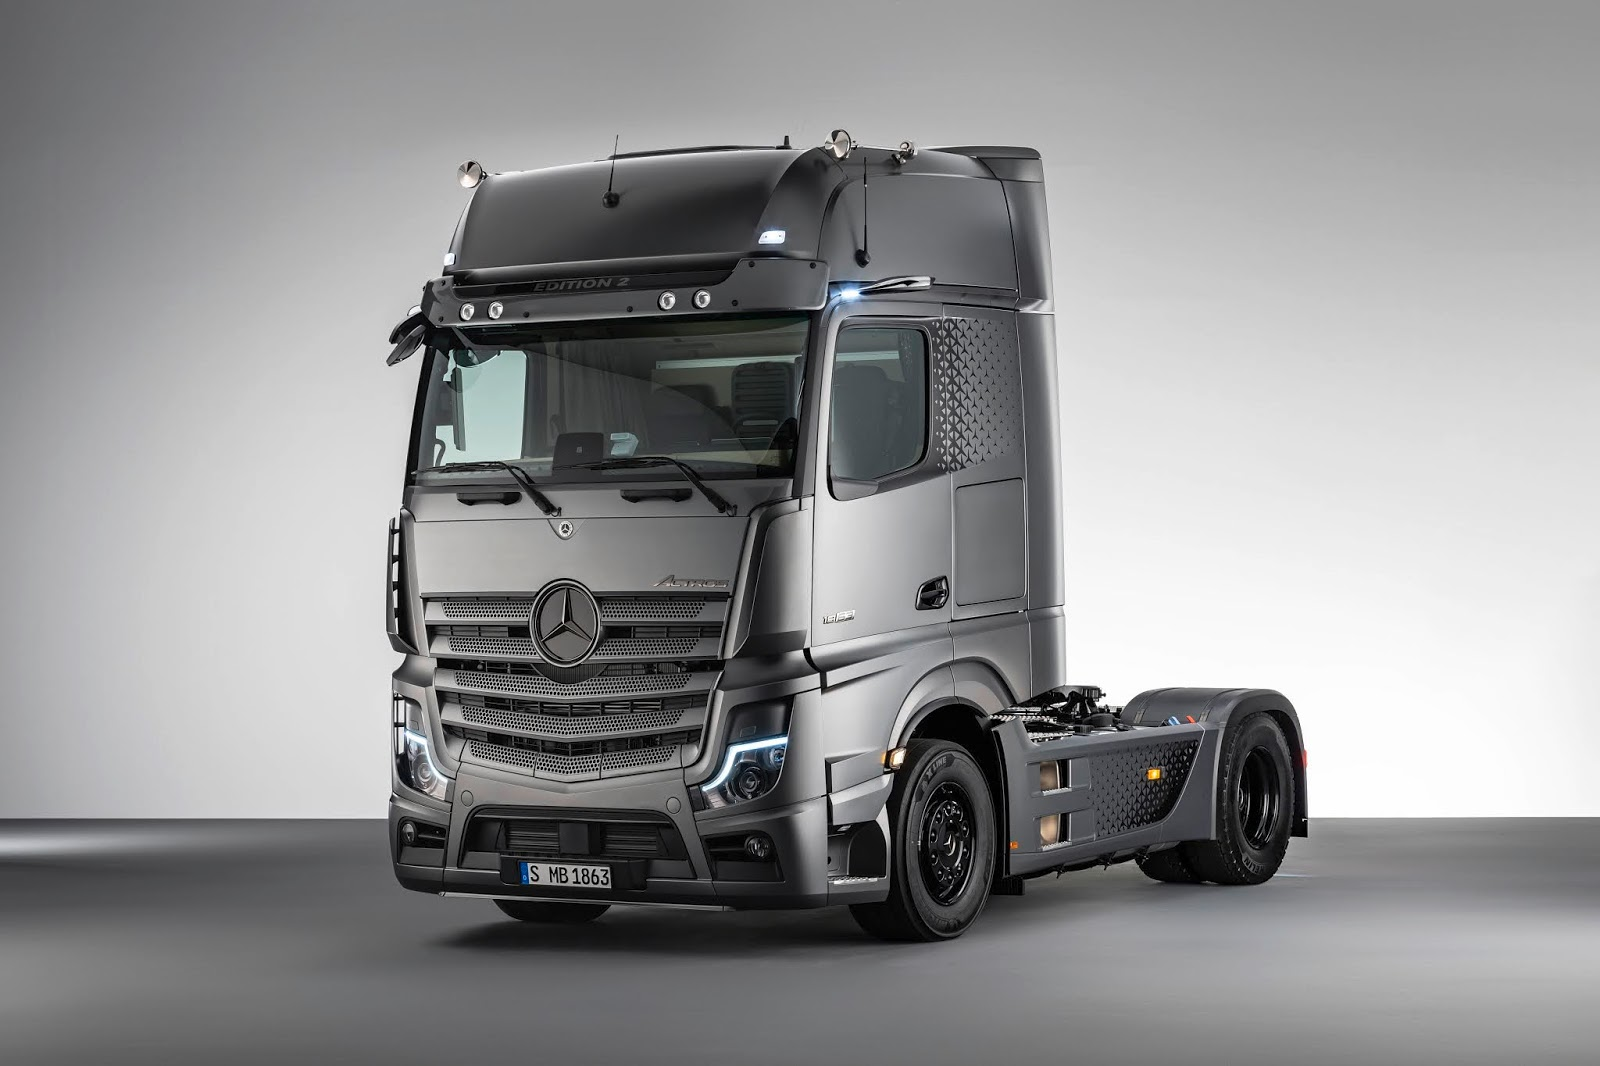 20C0493 005 Mercedes Trucks : Νέα έκδοση Actros, το νέο Arocs & 2 νέα συστήματα ασφαλείας